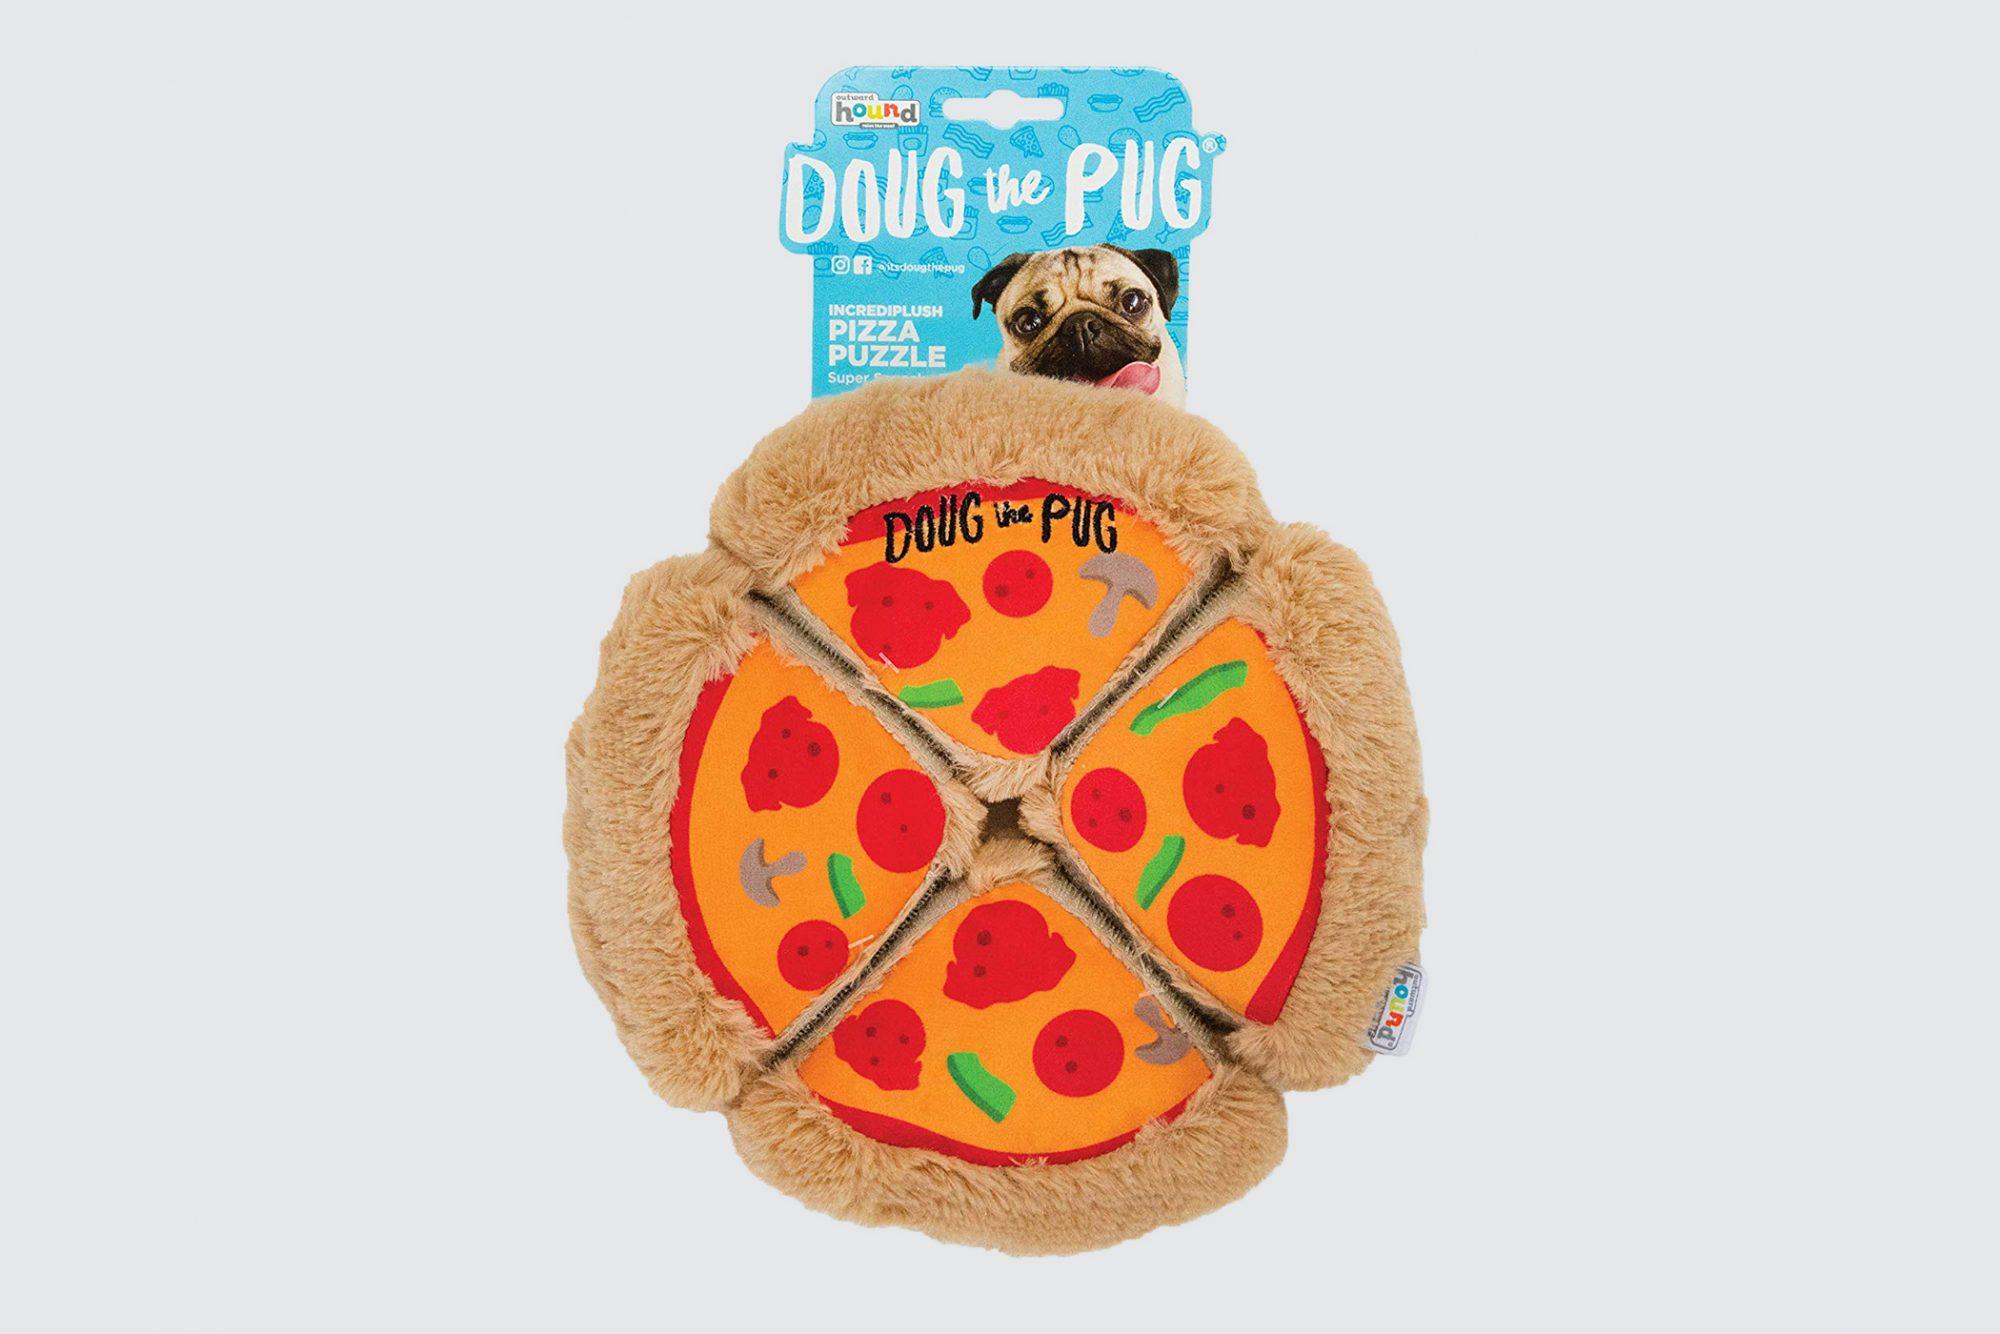 Outward Hound Doug the Pug Incrediplush Pizza Puzzle Squeaky Plush Dog Toy